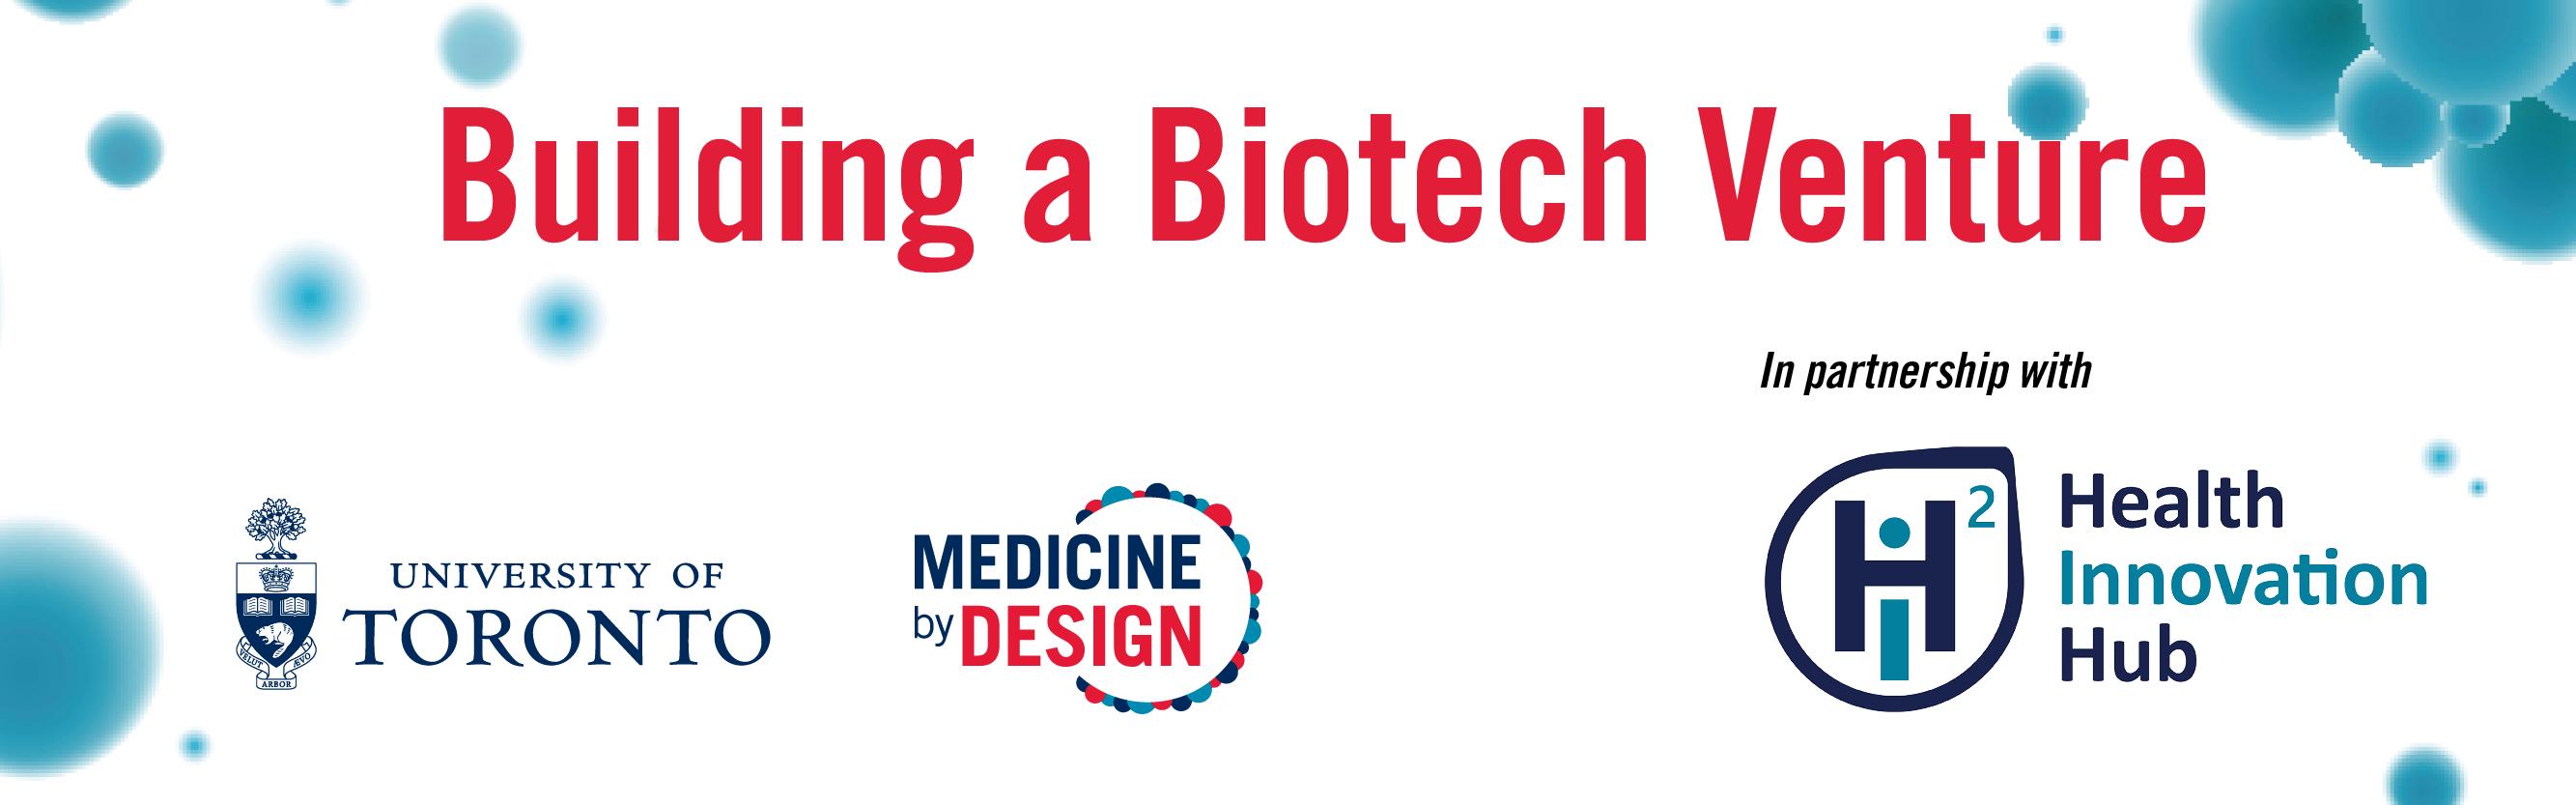 Banner Building a Biotech Venture